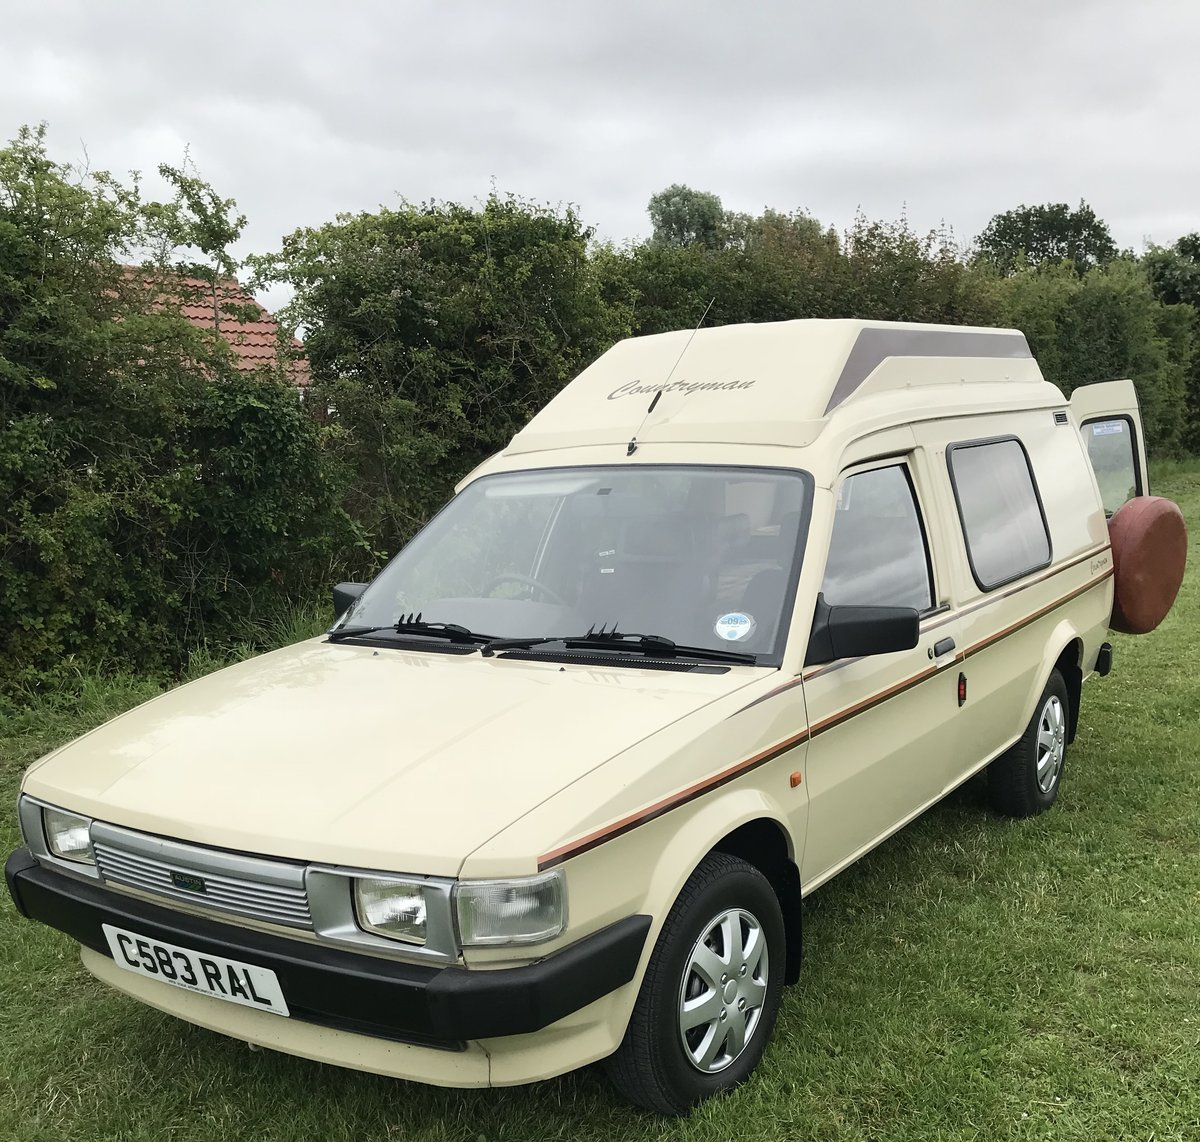 1986 Austin maestro  campervan For Sale (picture 3 of 6)